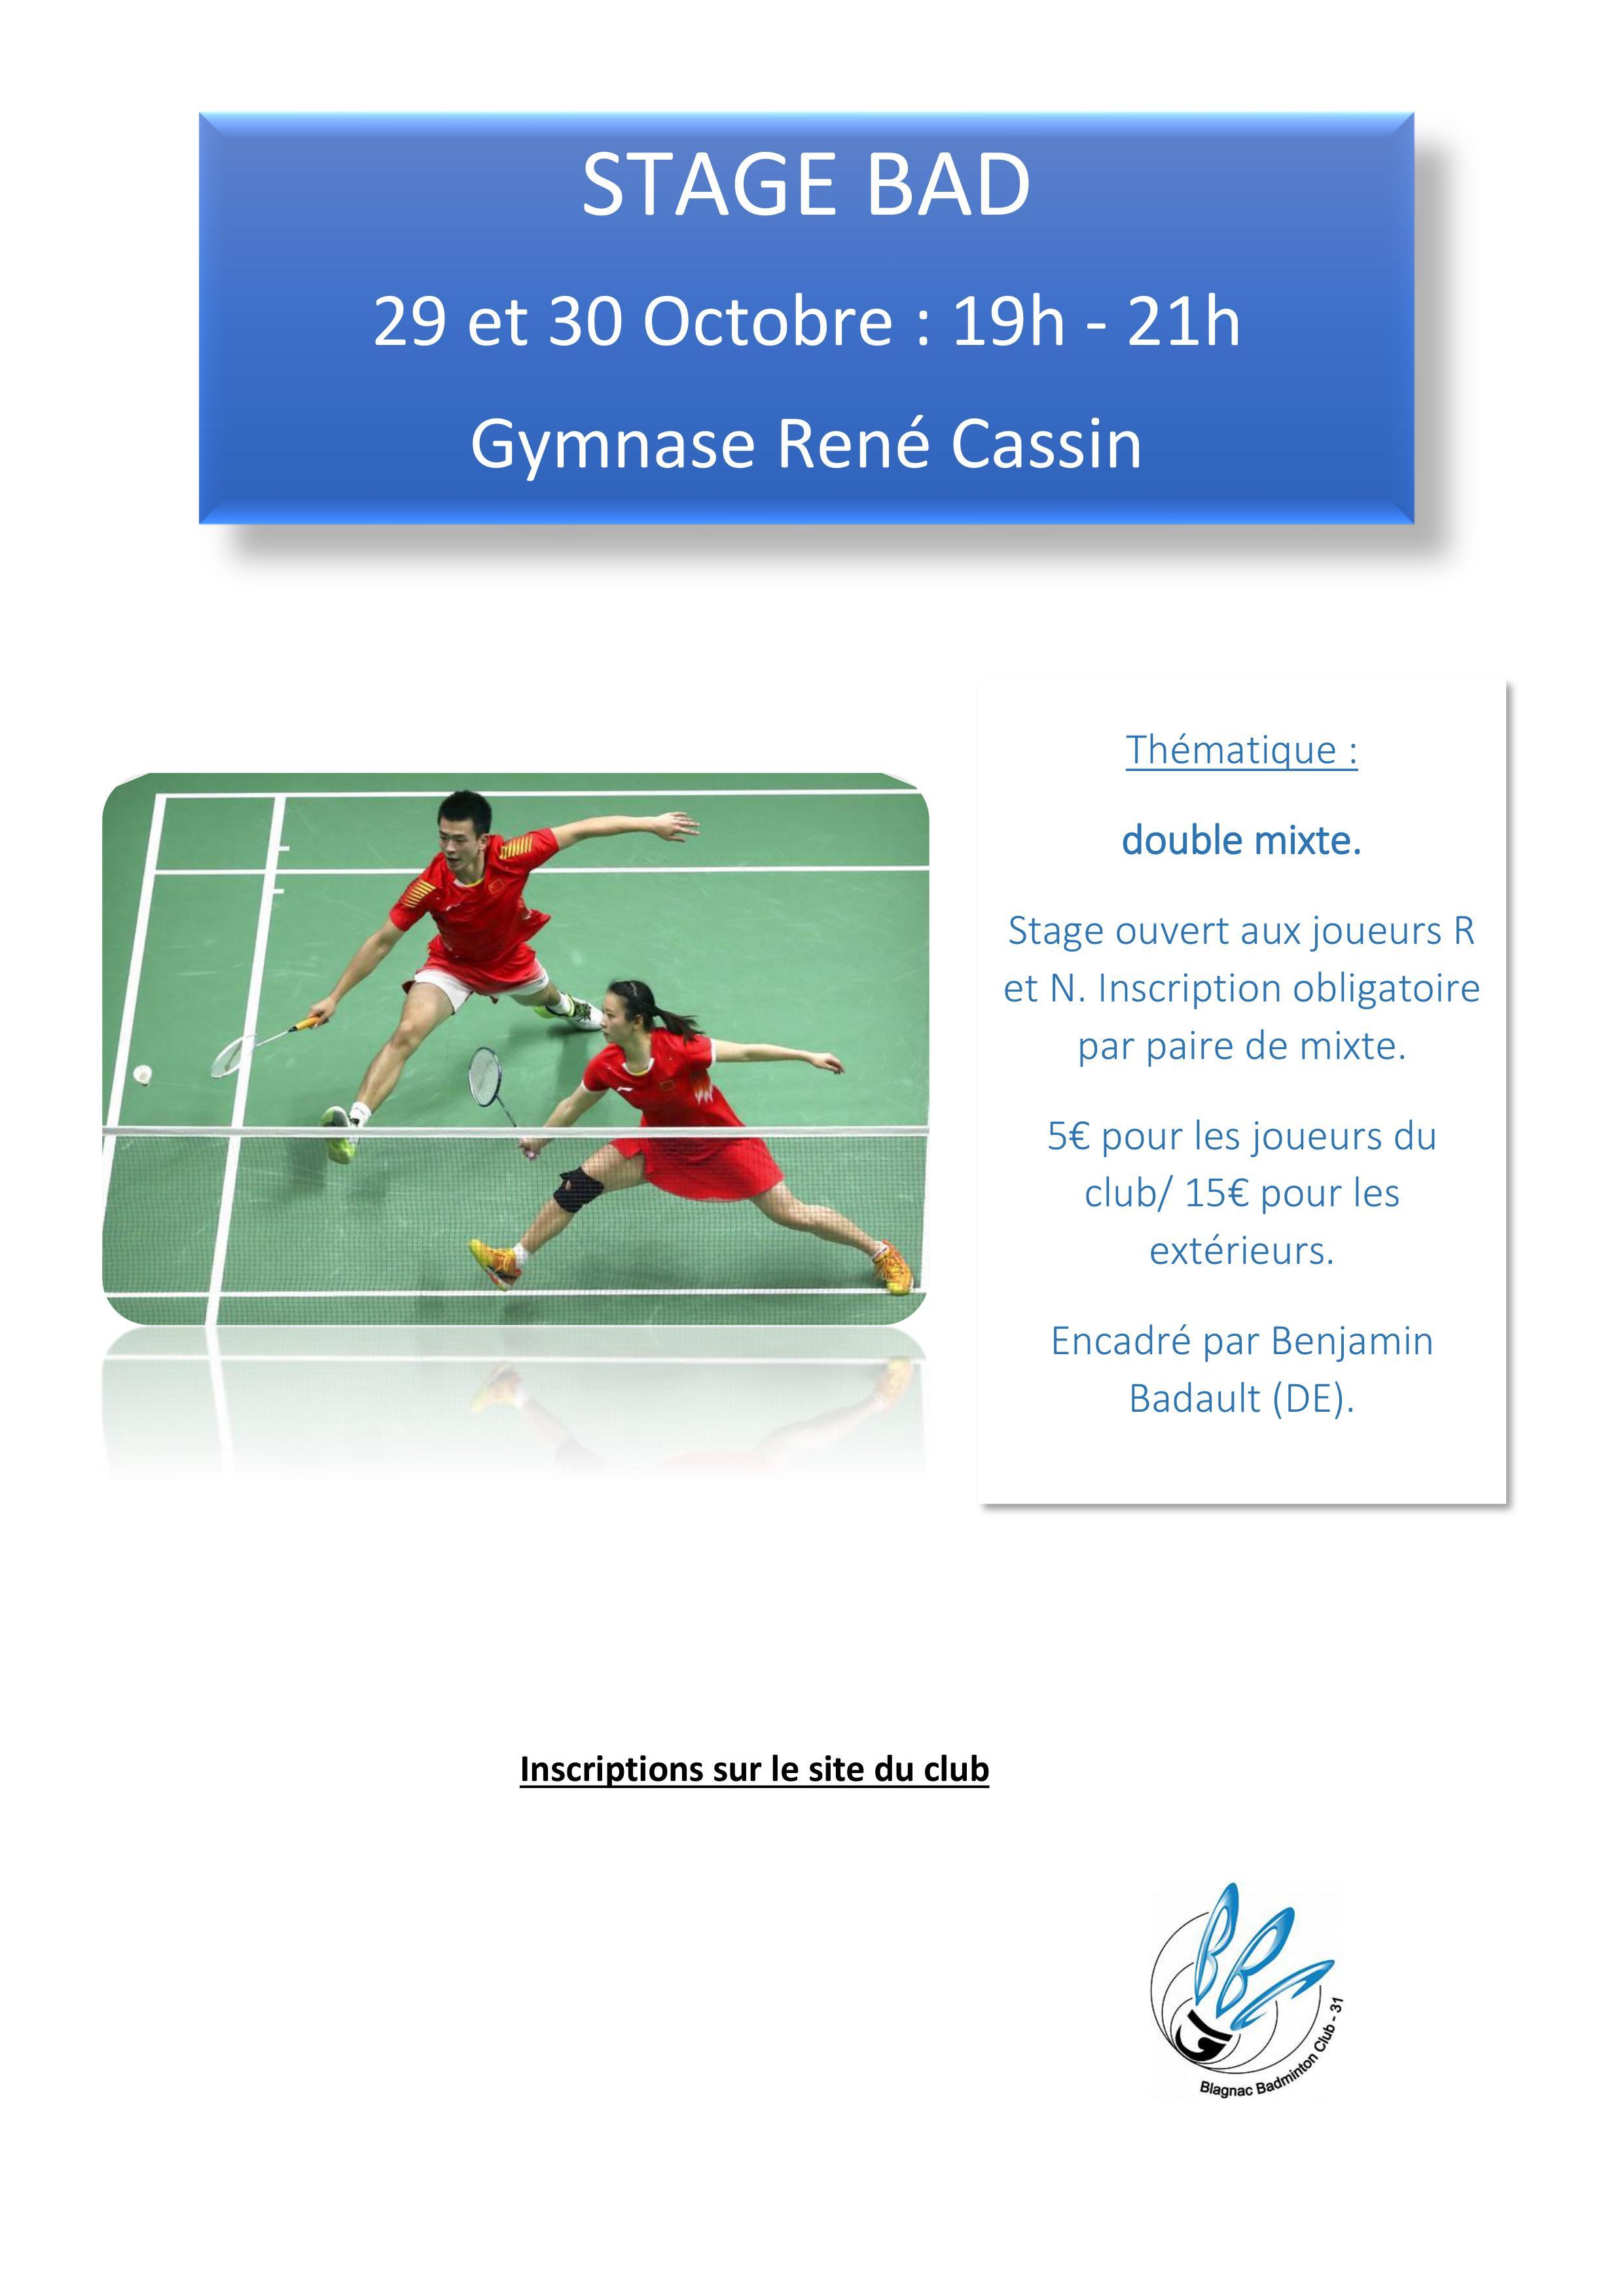 Blagnac Badminton Club